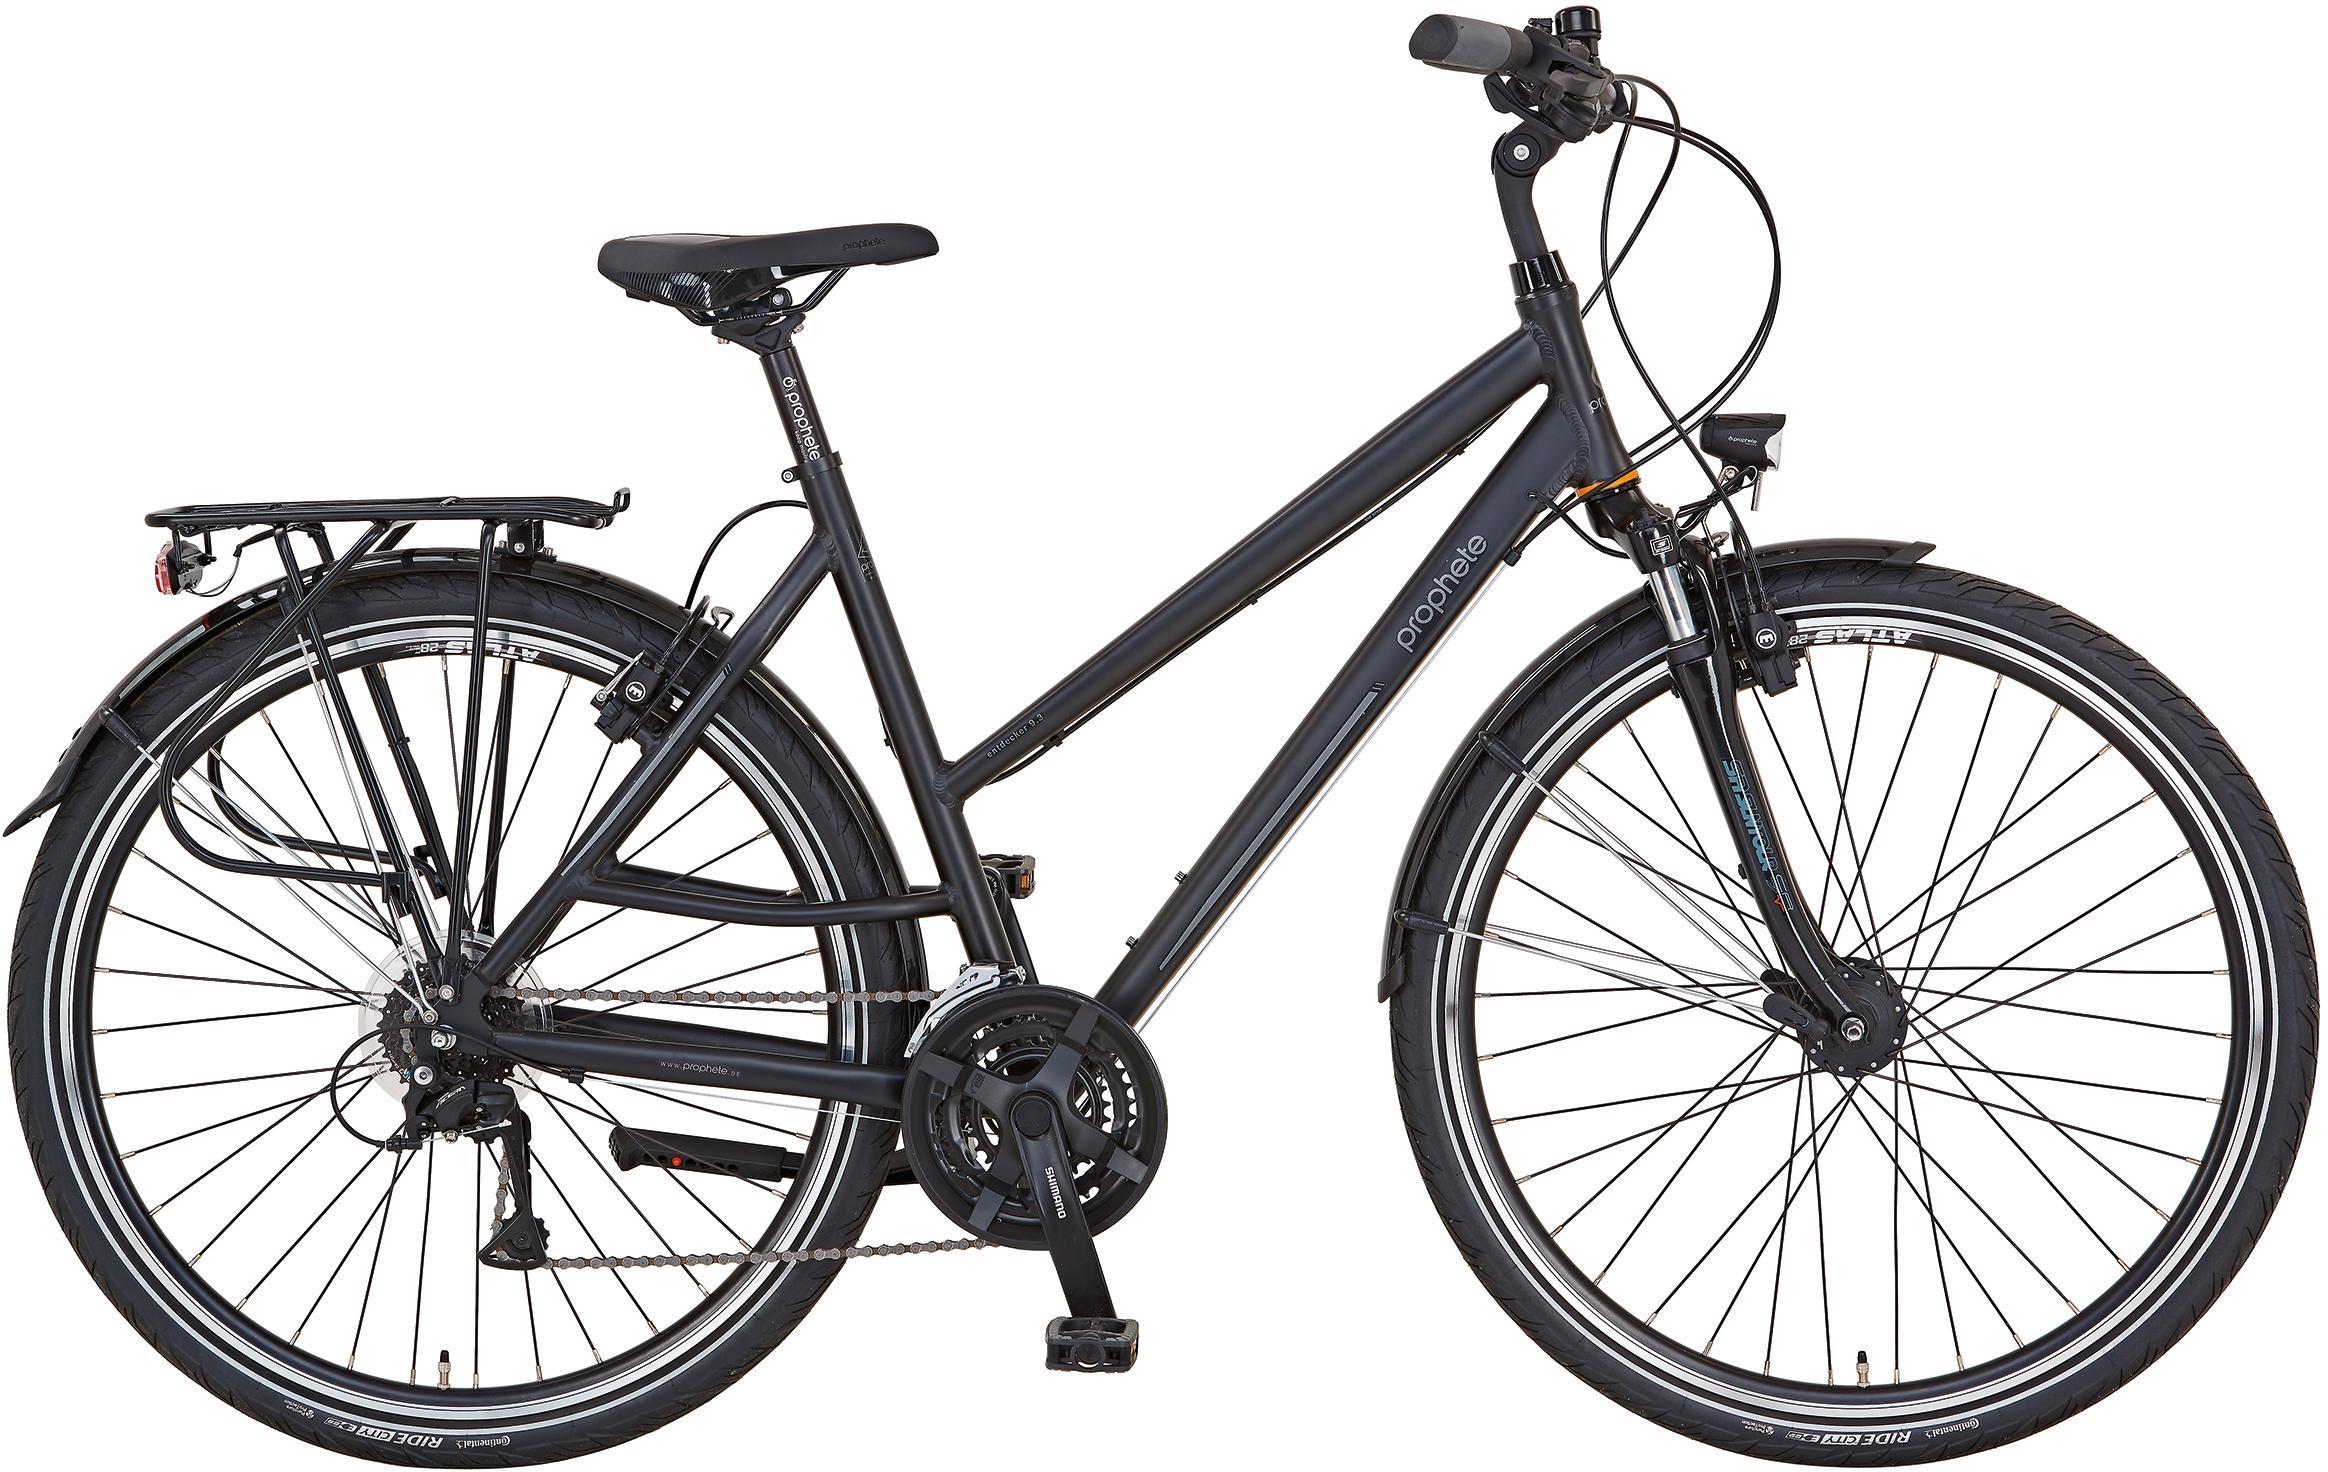 Prophete Trekkingrad PROPHETE ENTDECKER 93 Trekking Bike 28´´ Damen 24 Gang Kettenschaltun Preisvergleich